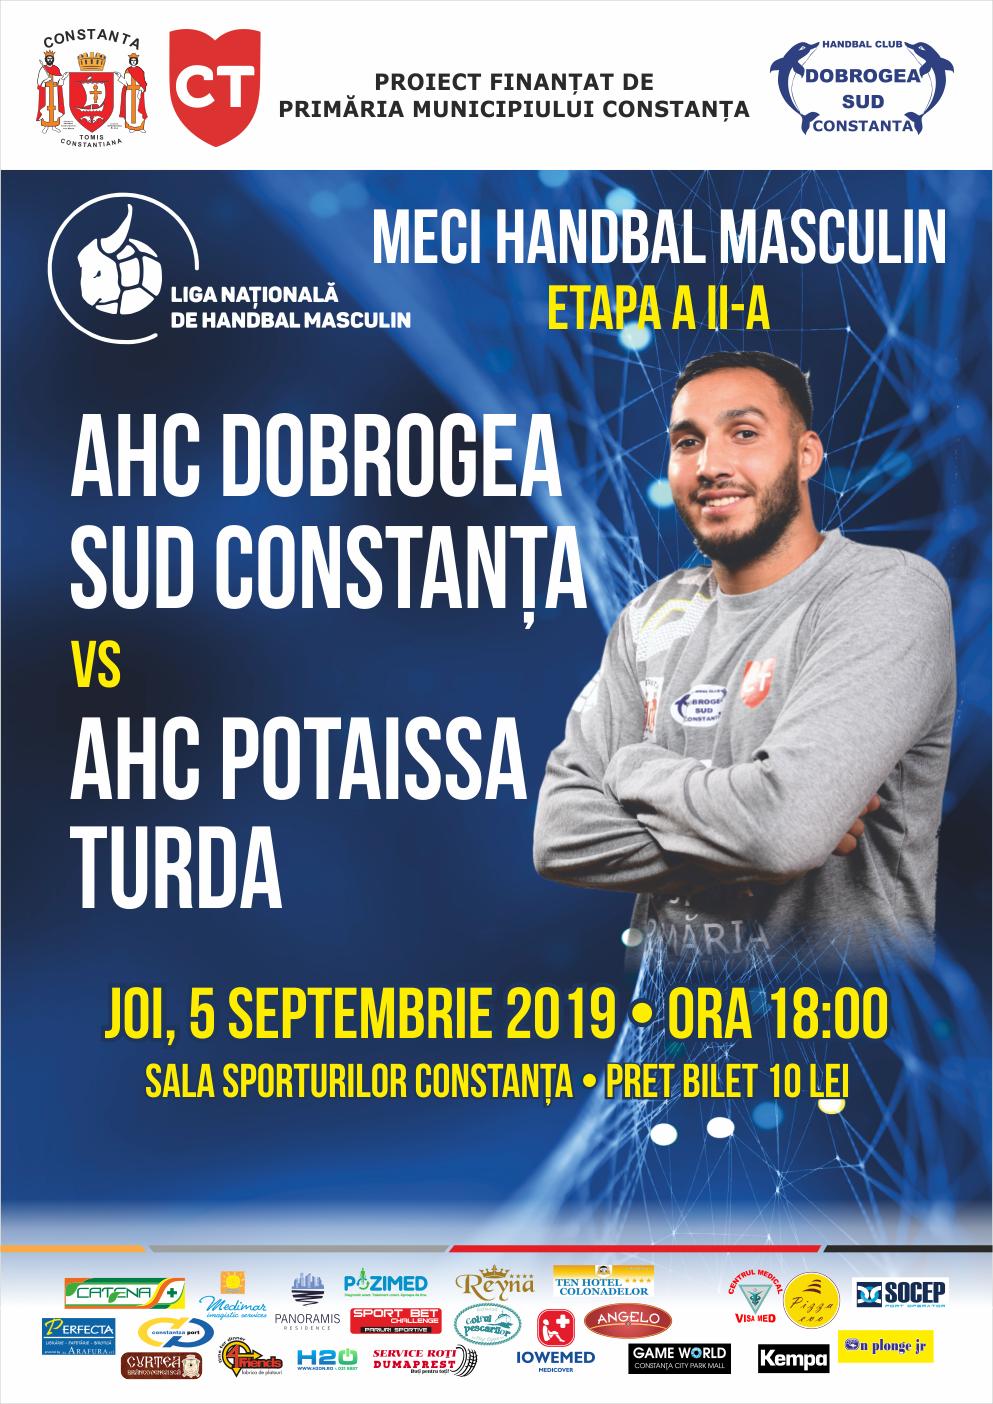 afis AHC Dobrogea SudConstanta vs. AHC Potaissa Turda 05.09.2019